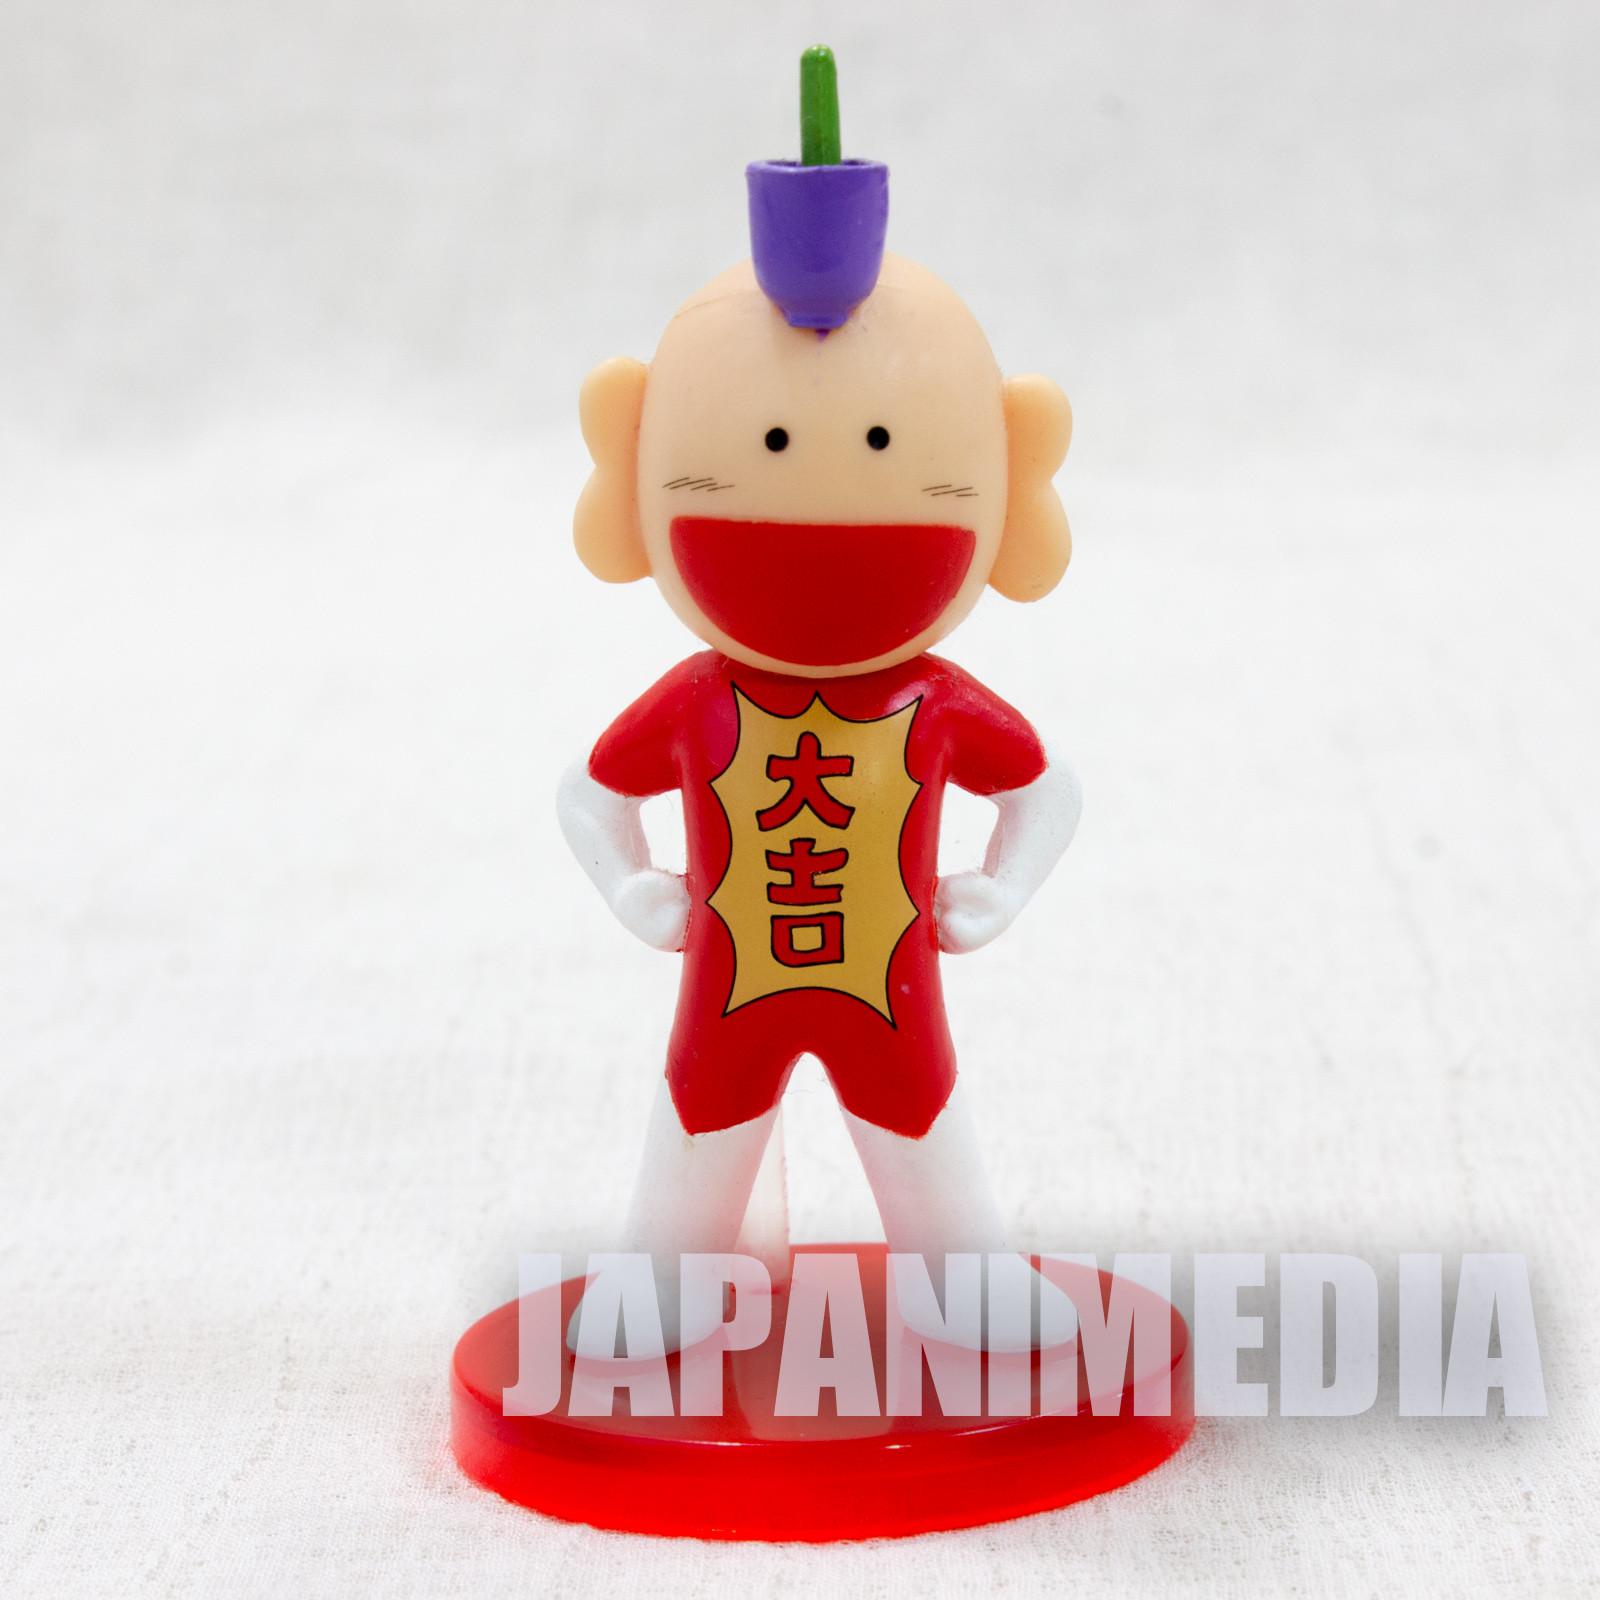 Tottemo Luckyman Mini Figure WCF Banpresto JAPAN ANIME SHONEN JUMP